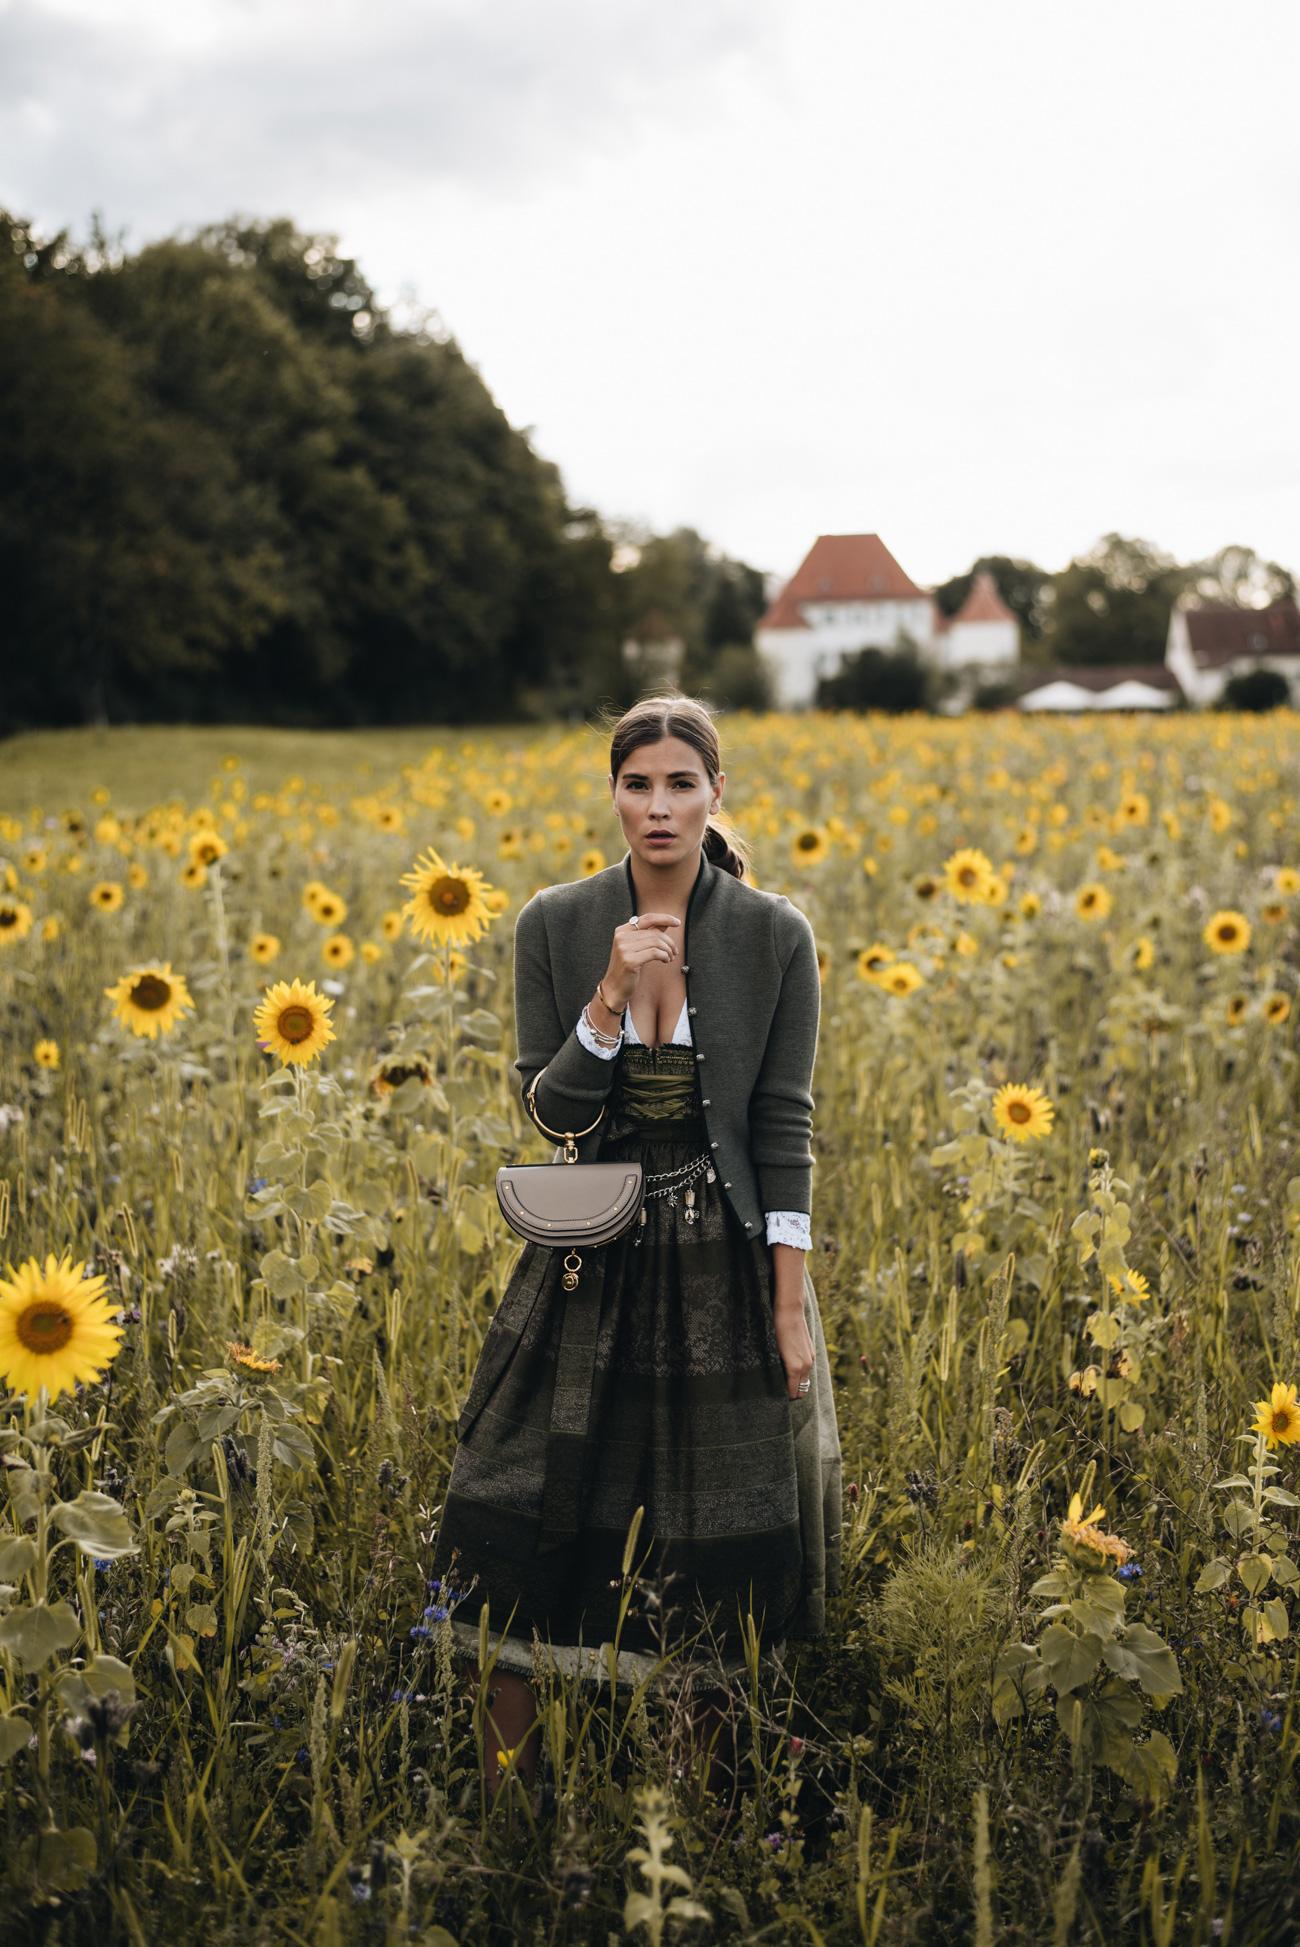 nina-schwichtenberg-fashiioncarpet-dirndl-2017-grün-khaki-spitzenbluse-chloé-nile-bag-sonnenblumen-feld-münchen